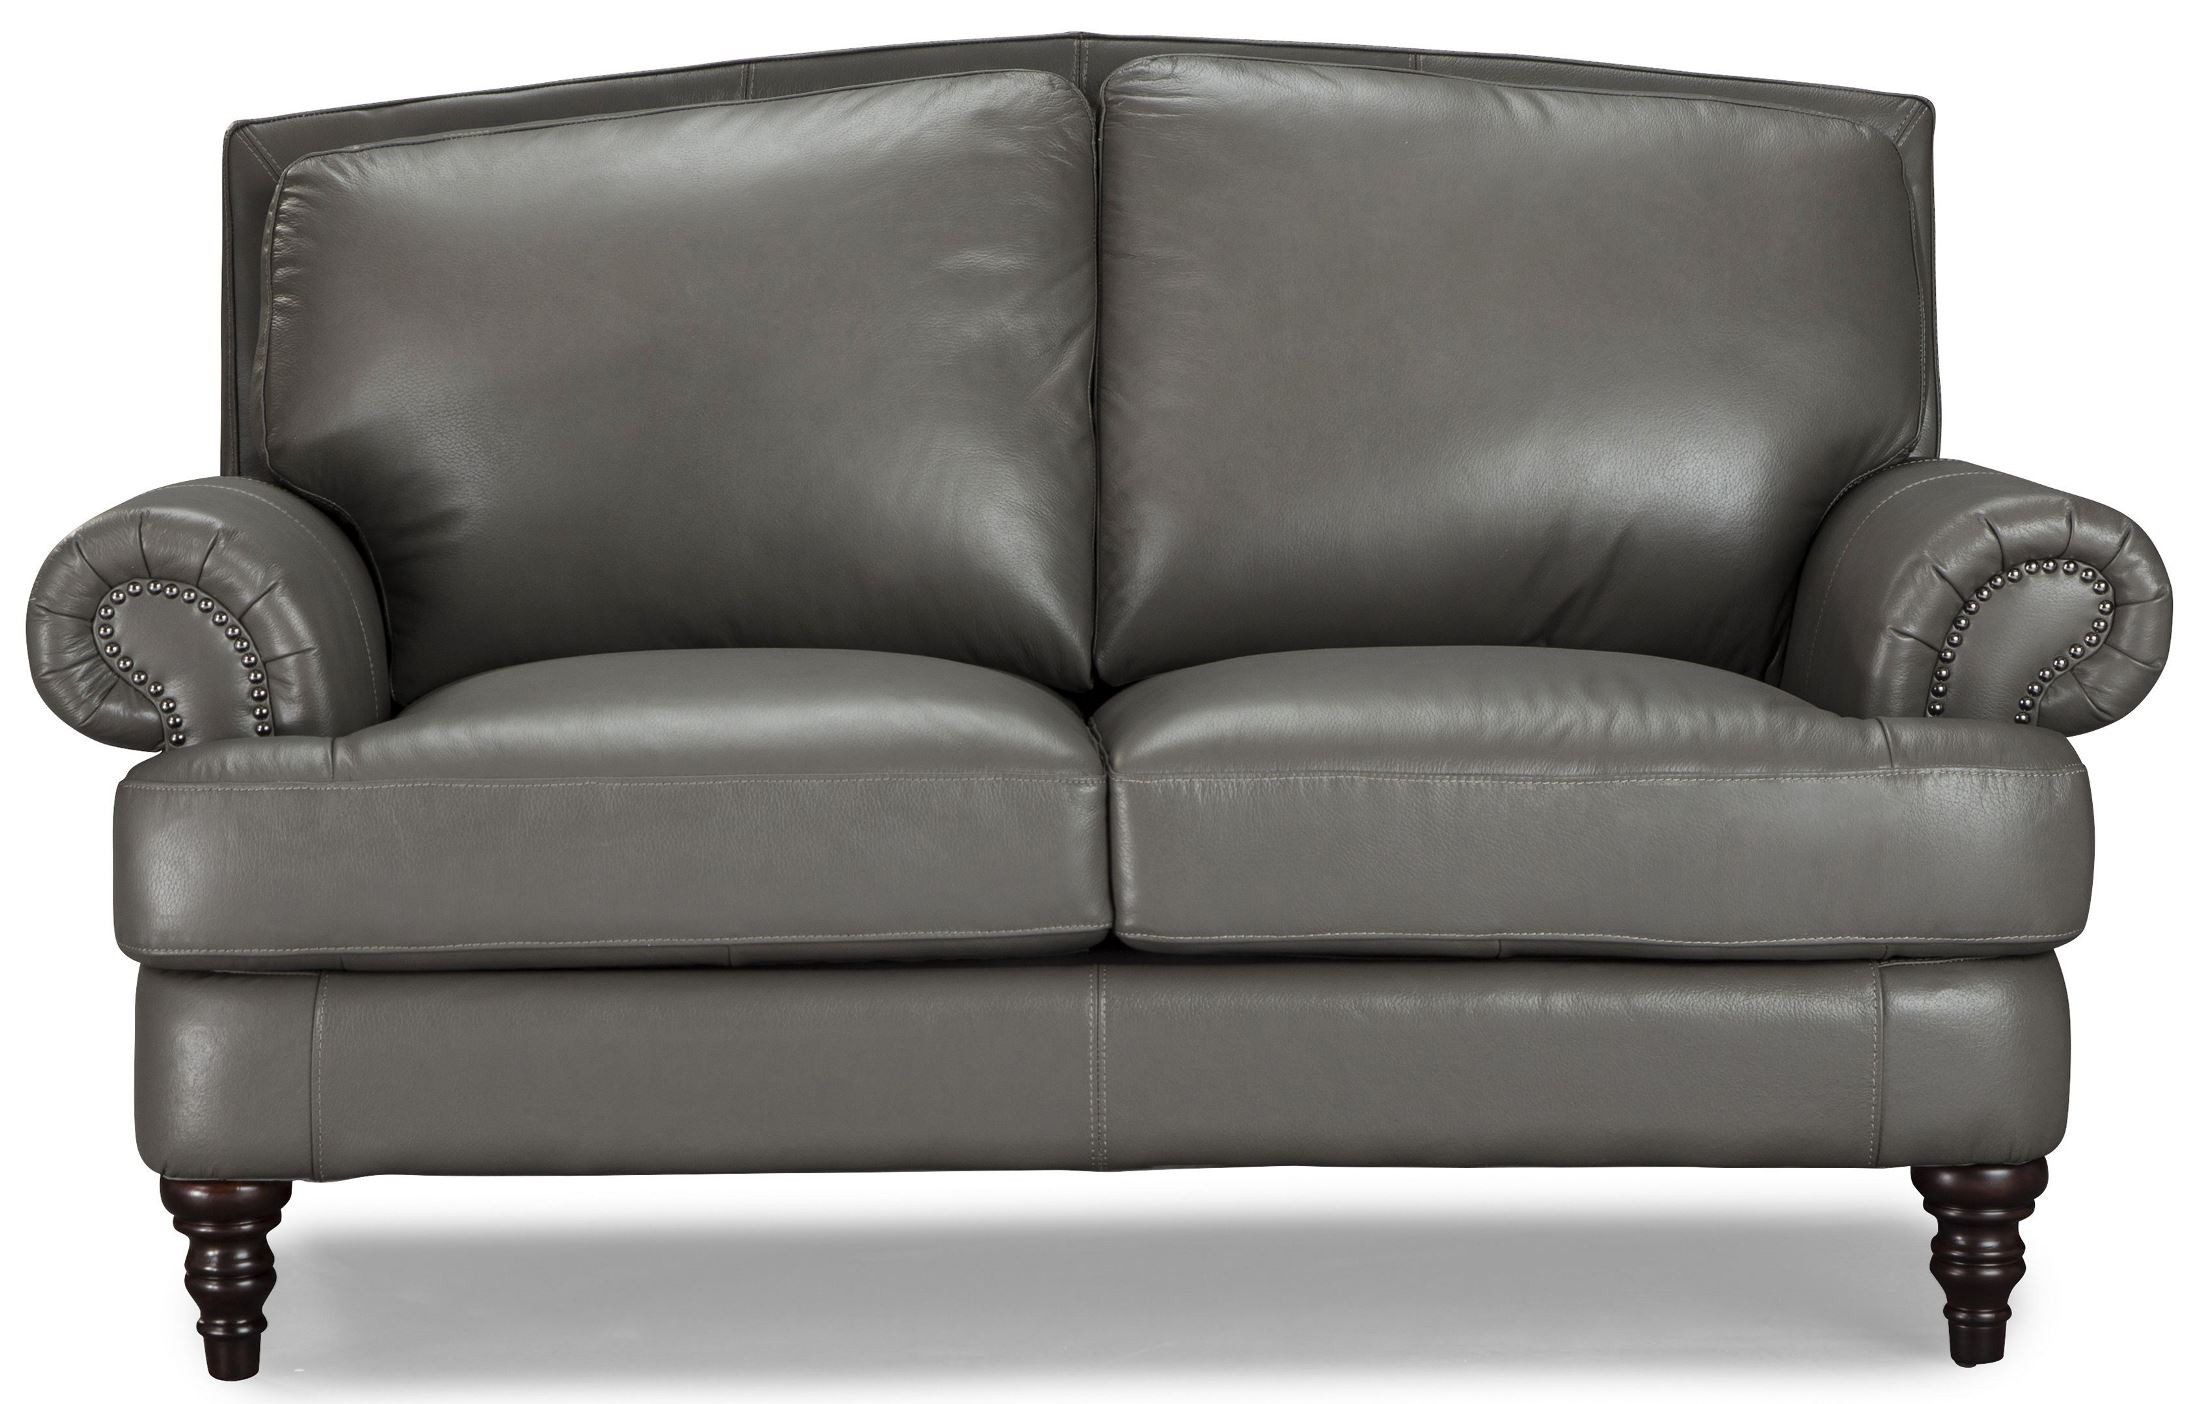 Juliette Battleship Grey Leather Living Room Set From Lazzaro Coleman Furniture